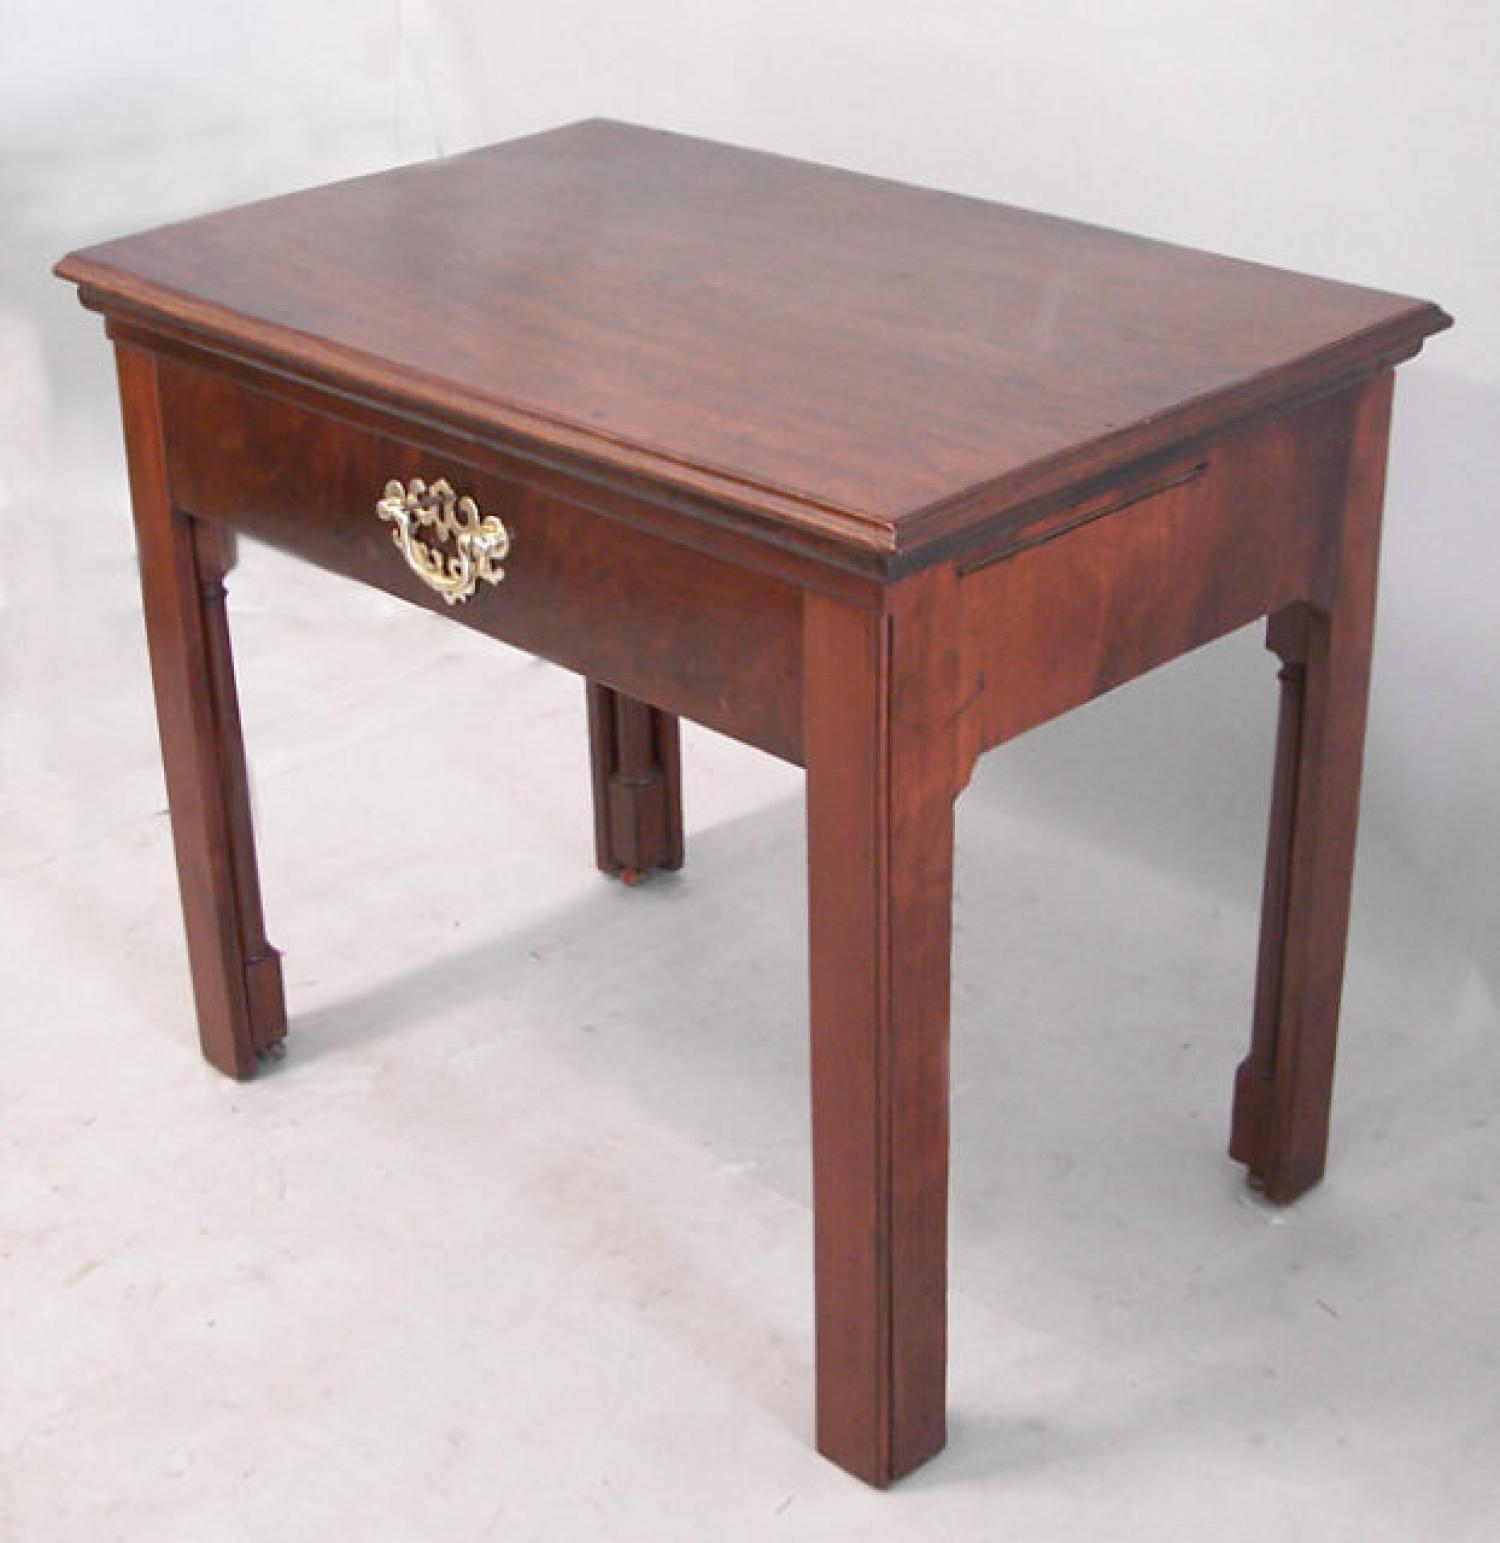 English mahogany architects desk c1790